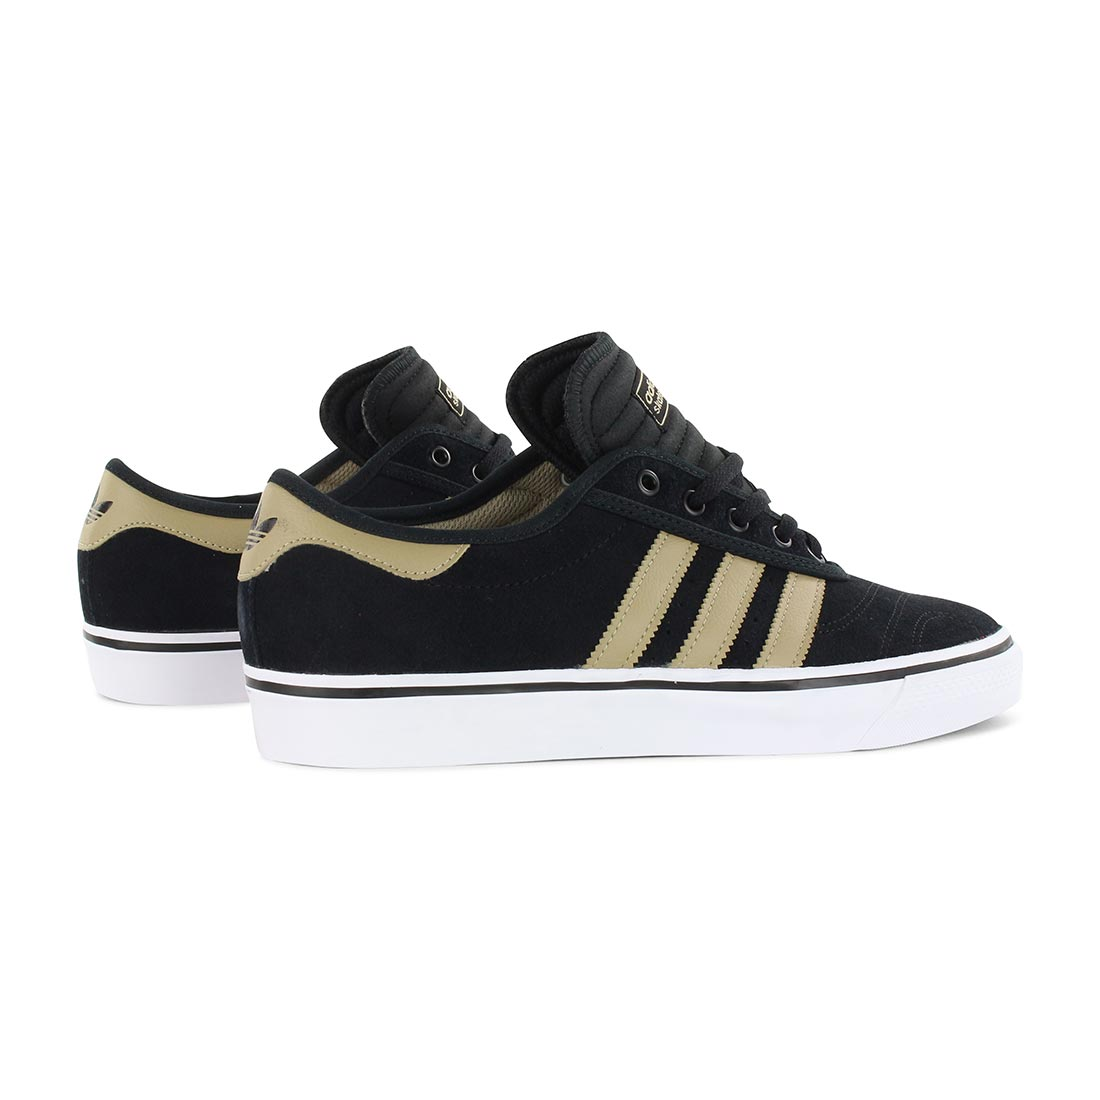 caa2cbb47d79 ... White  Adidas-Adi-Ease-Premiere-Shoes-Black-Raw-Gold ...